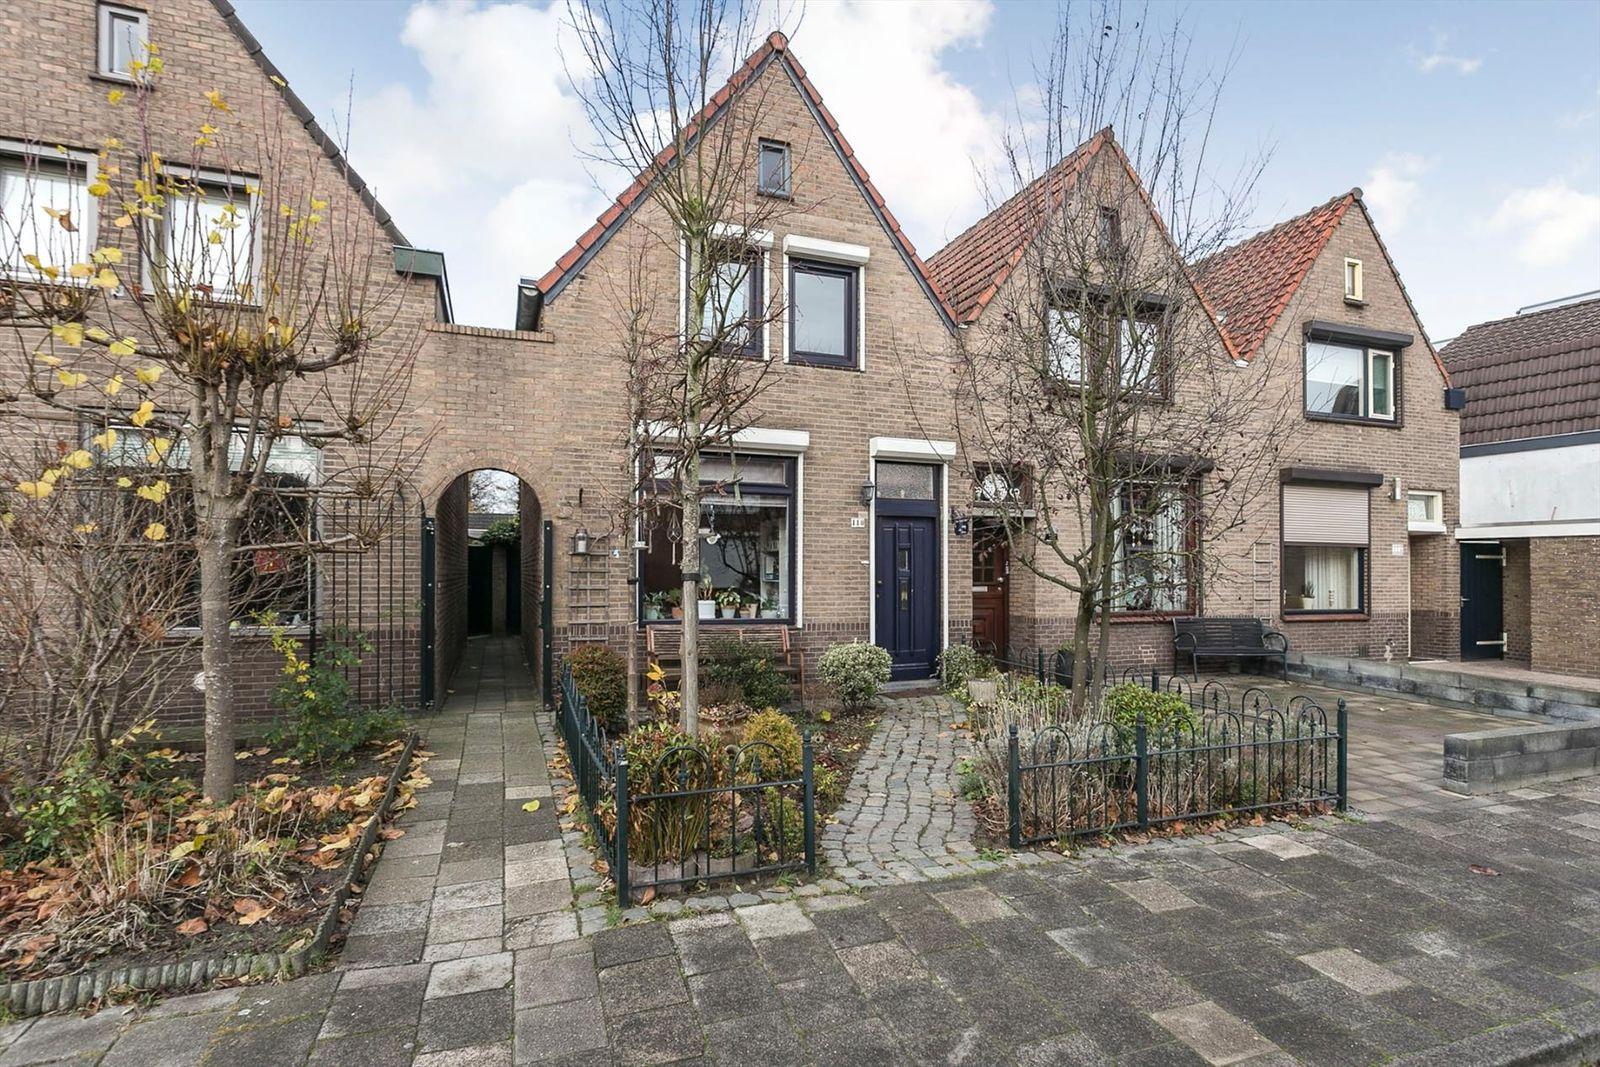 Hulsdonksestraat 118, Roosendaal